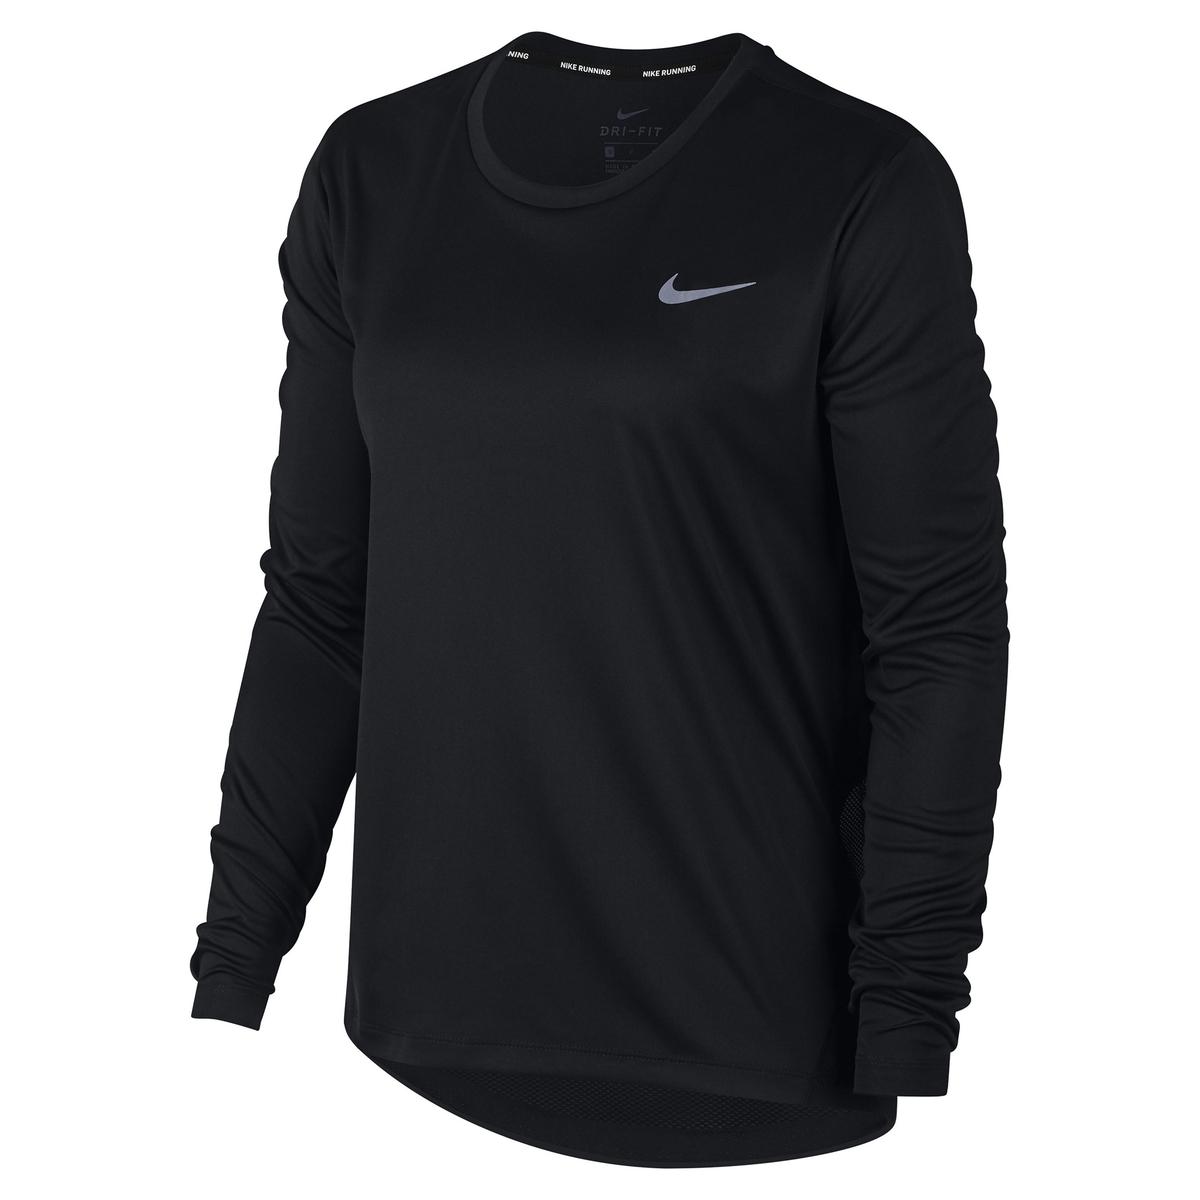 Camiseta de running Nike Miler de manga larga